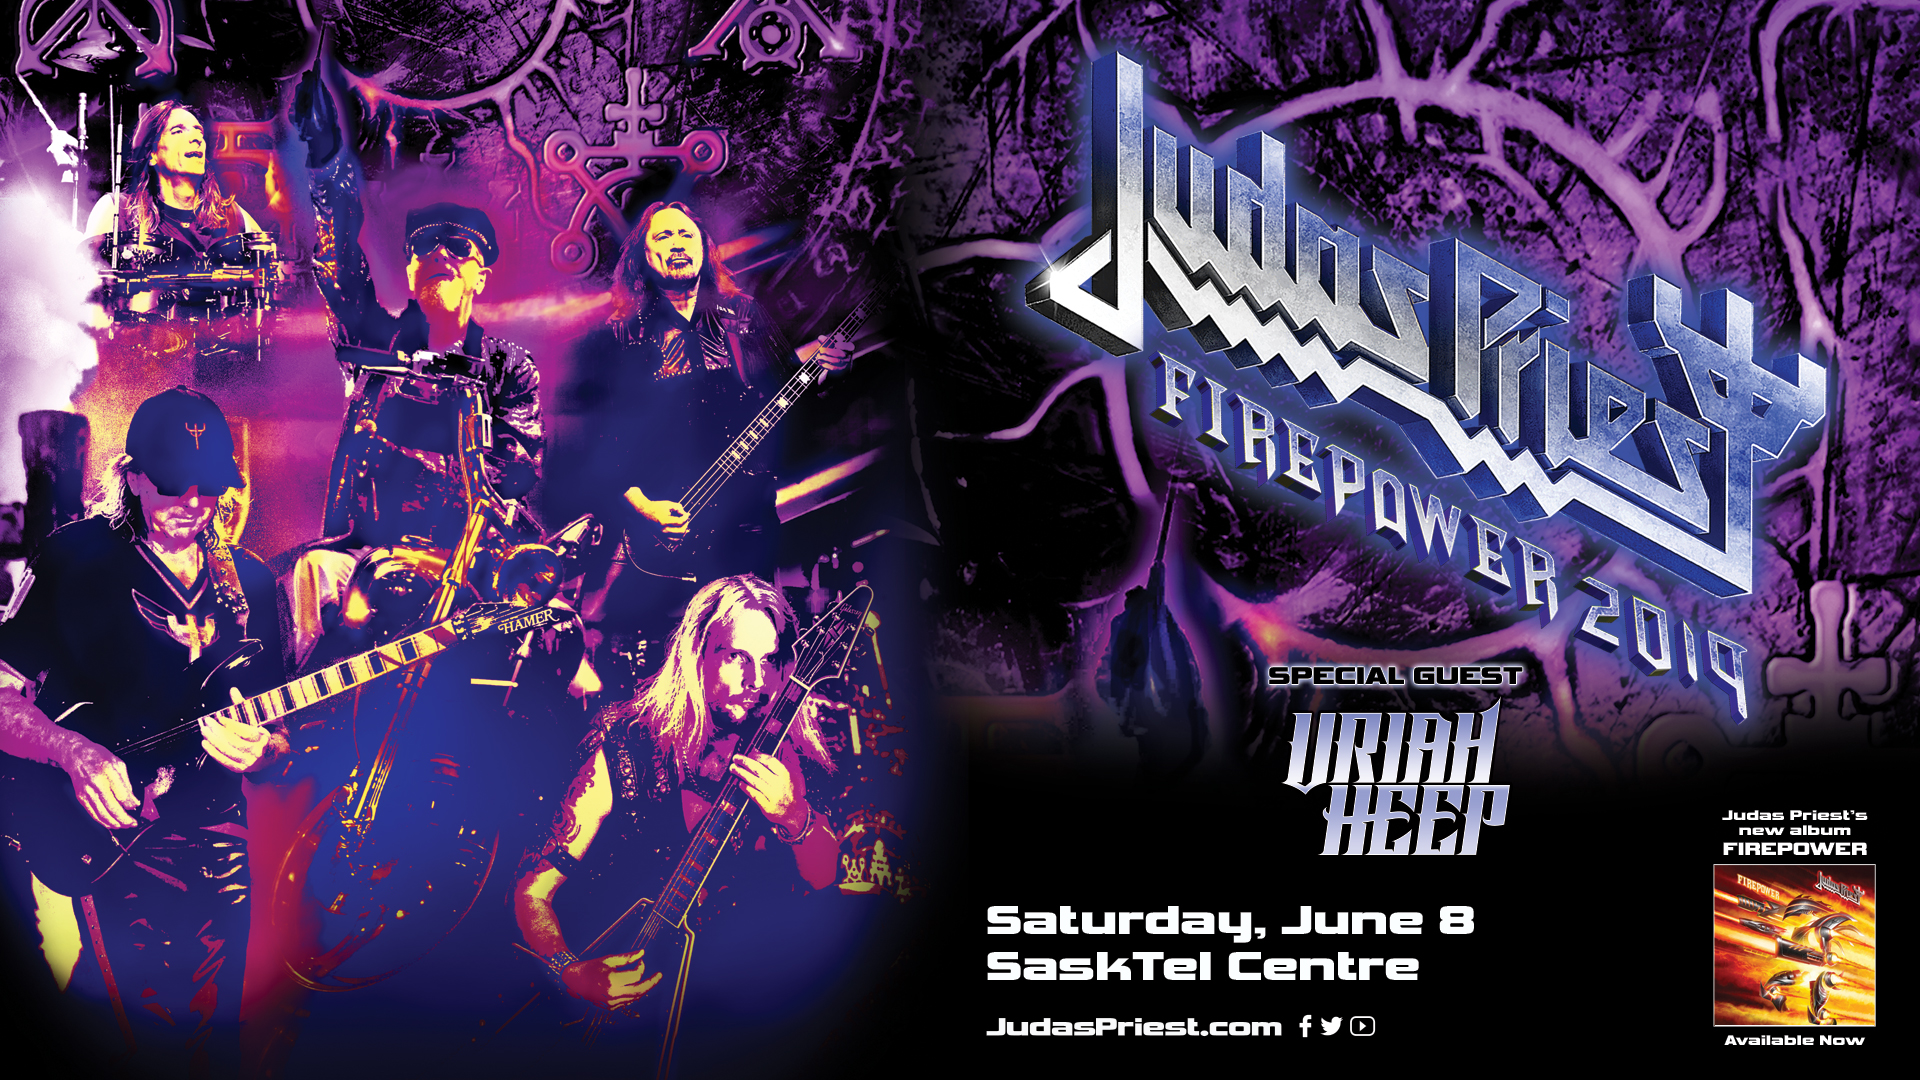 Judas Priest With Special Guest Uriah Heep 980 Cjme